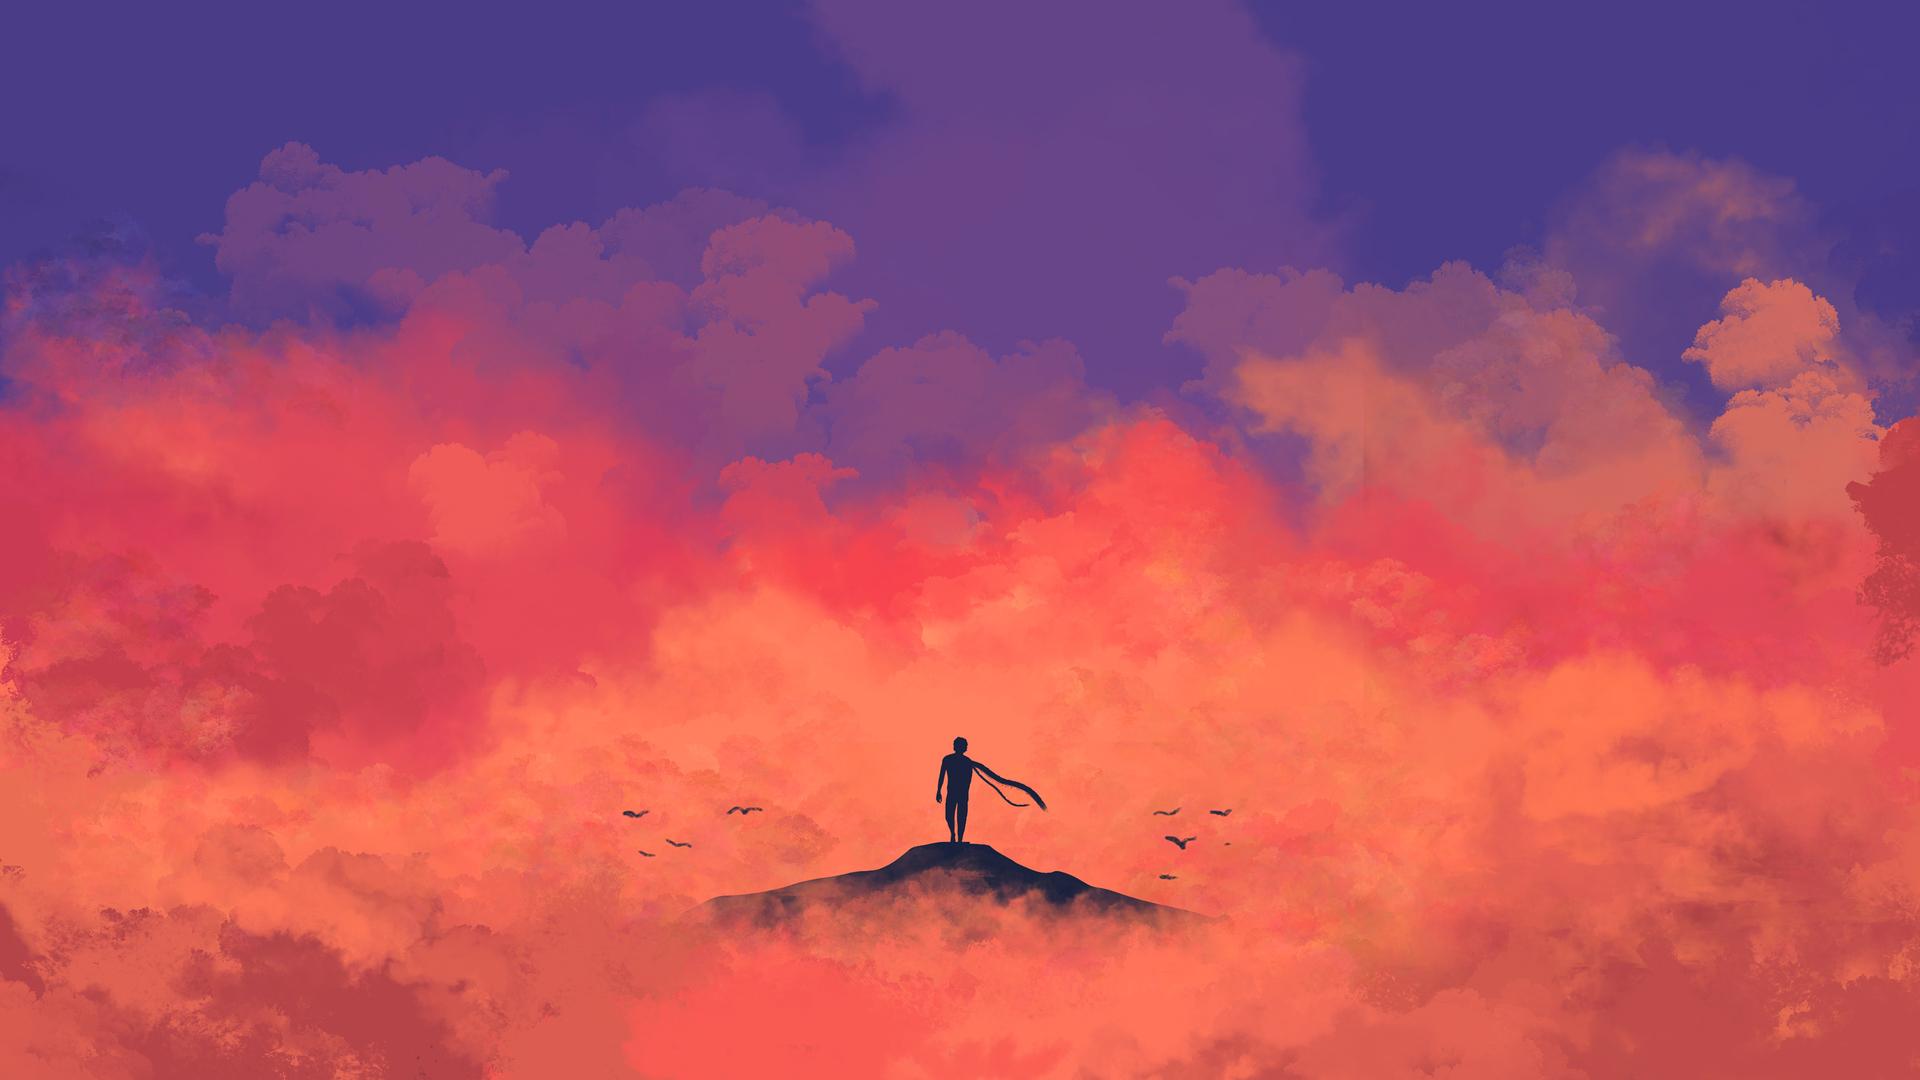 anime-minimalism-4k-4e.jpg